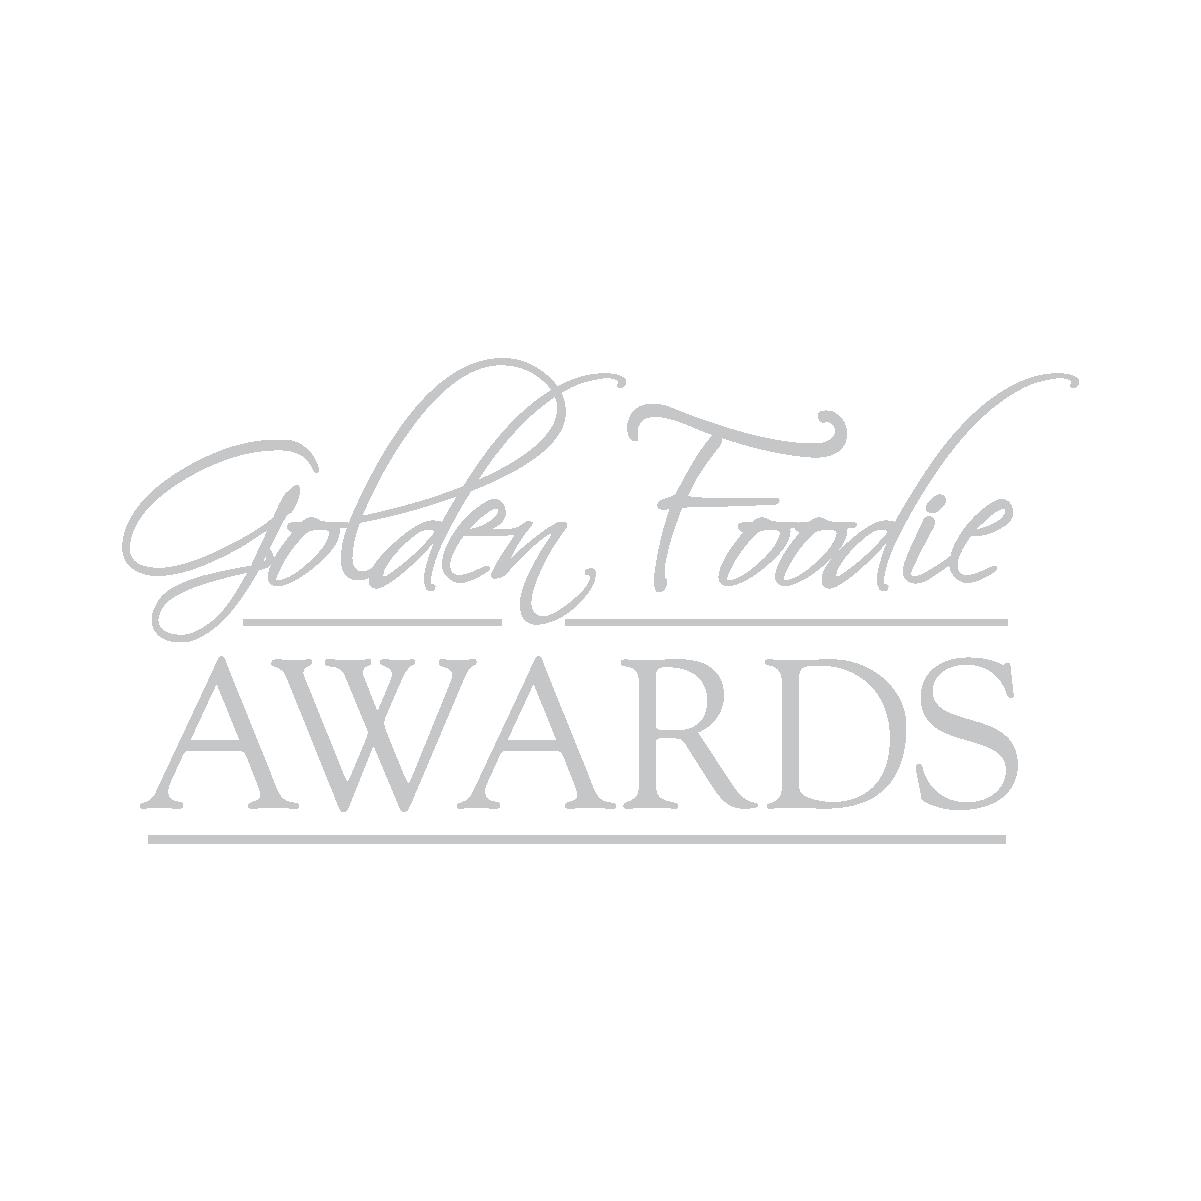 GOlden Foodie Awards.png